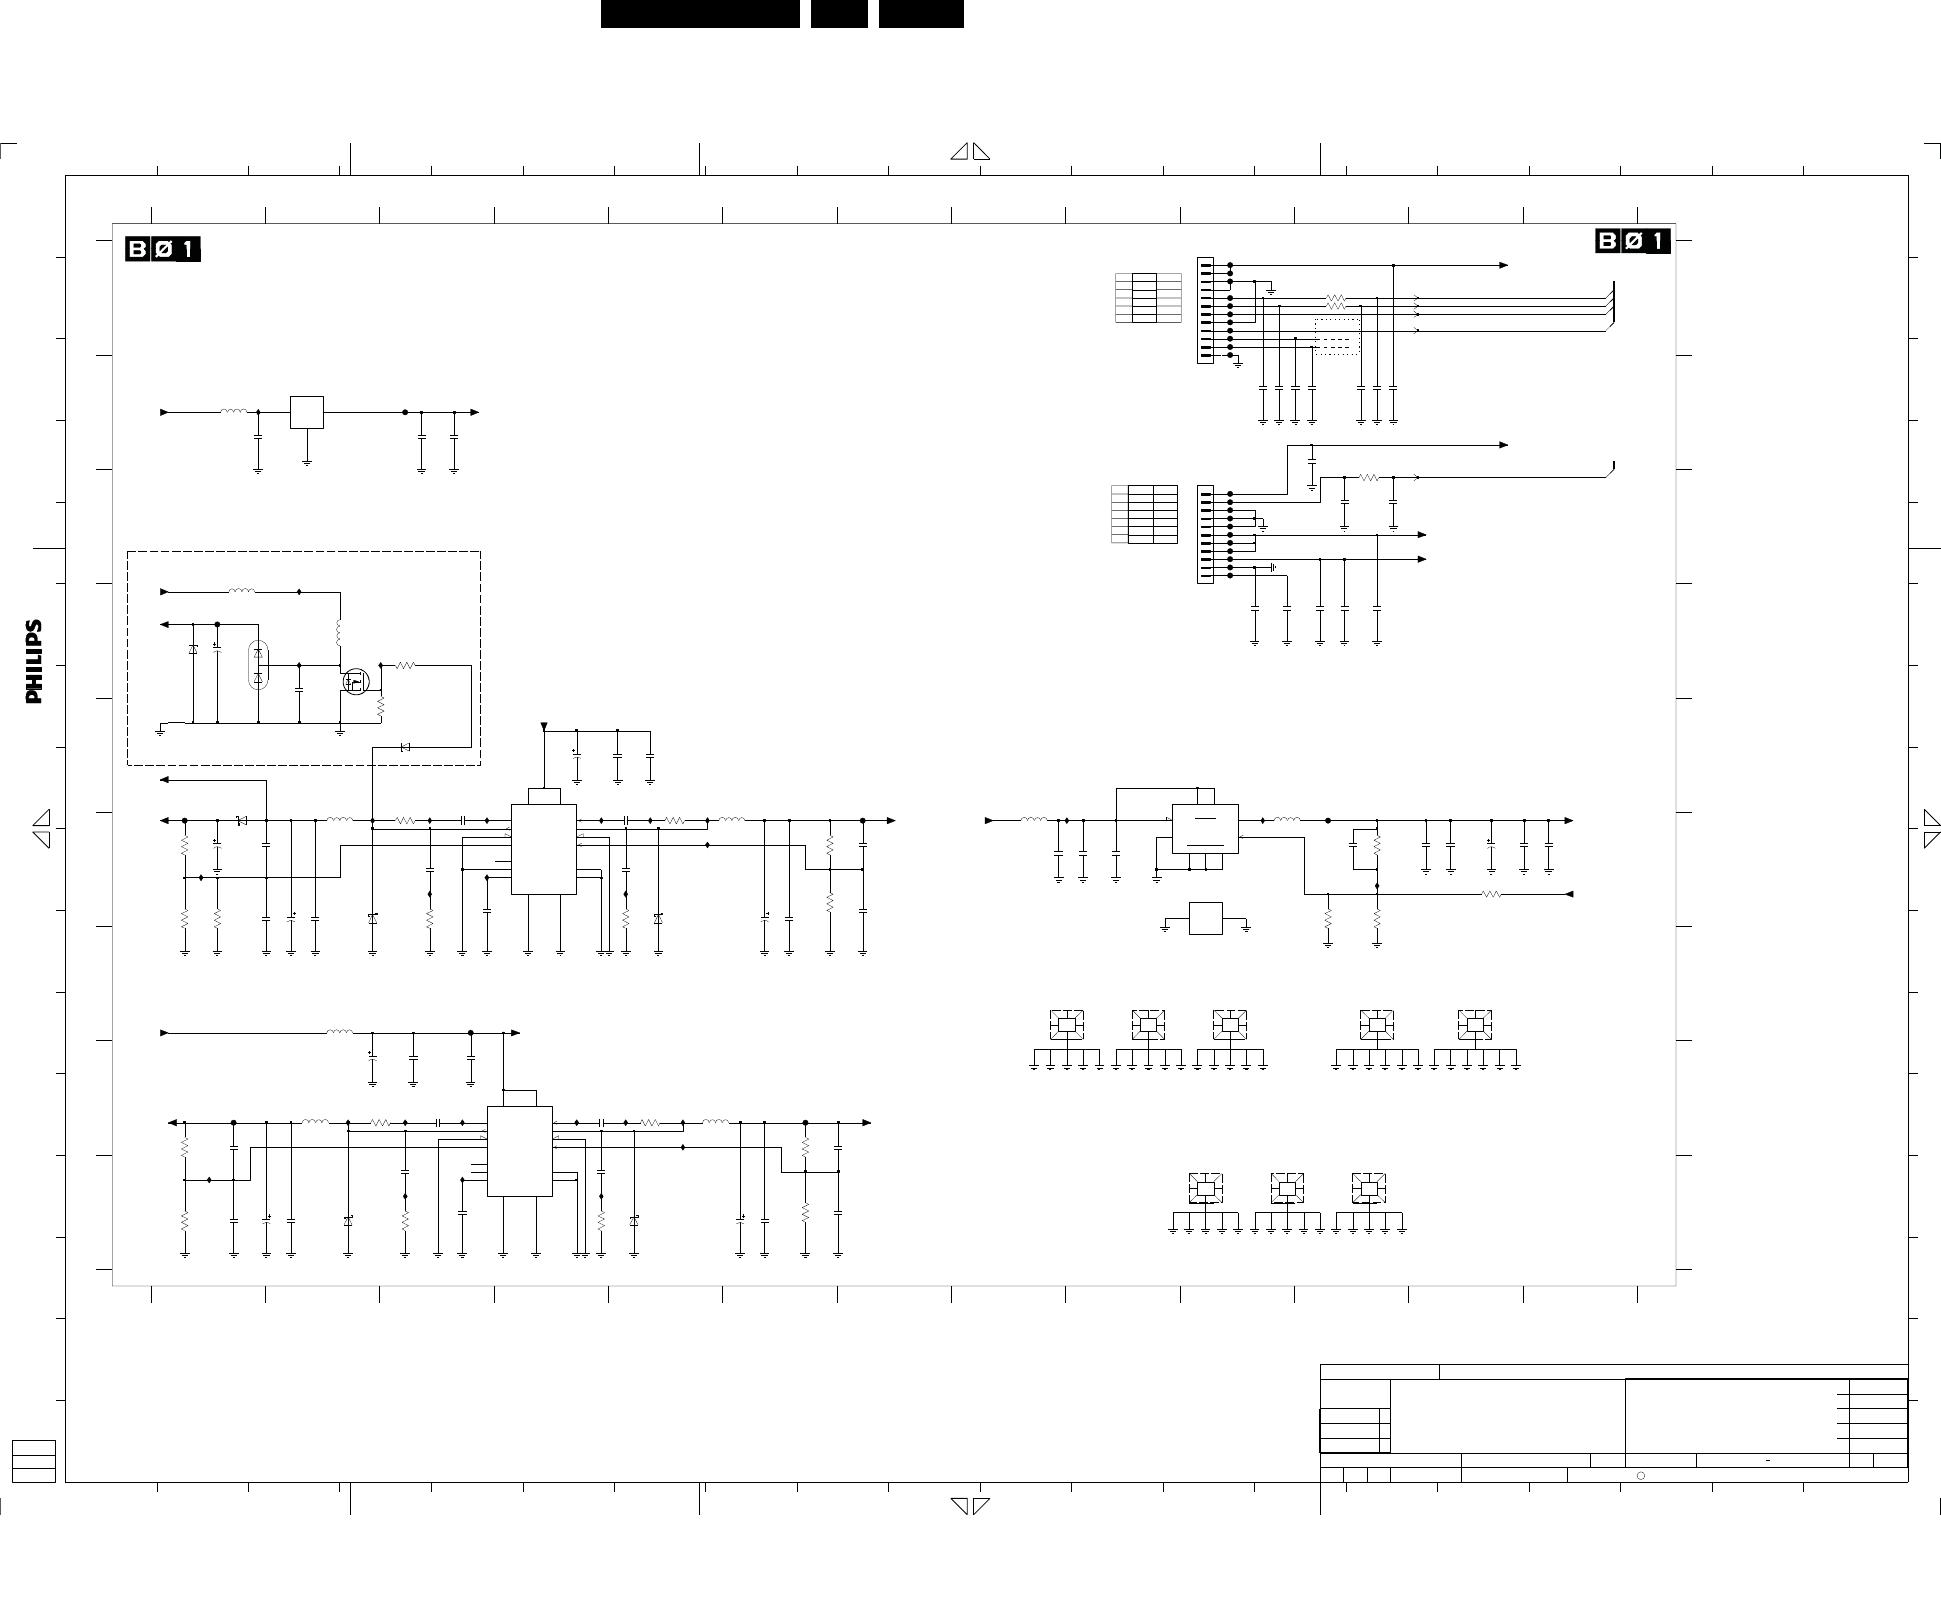 Lc92l La 3122 785 18700 100701 42pfl5604d 78 Lc92lla Ih 606 Wiring Diagram Circuit Diagrams And Pwb Layouts En 57lc92l 10